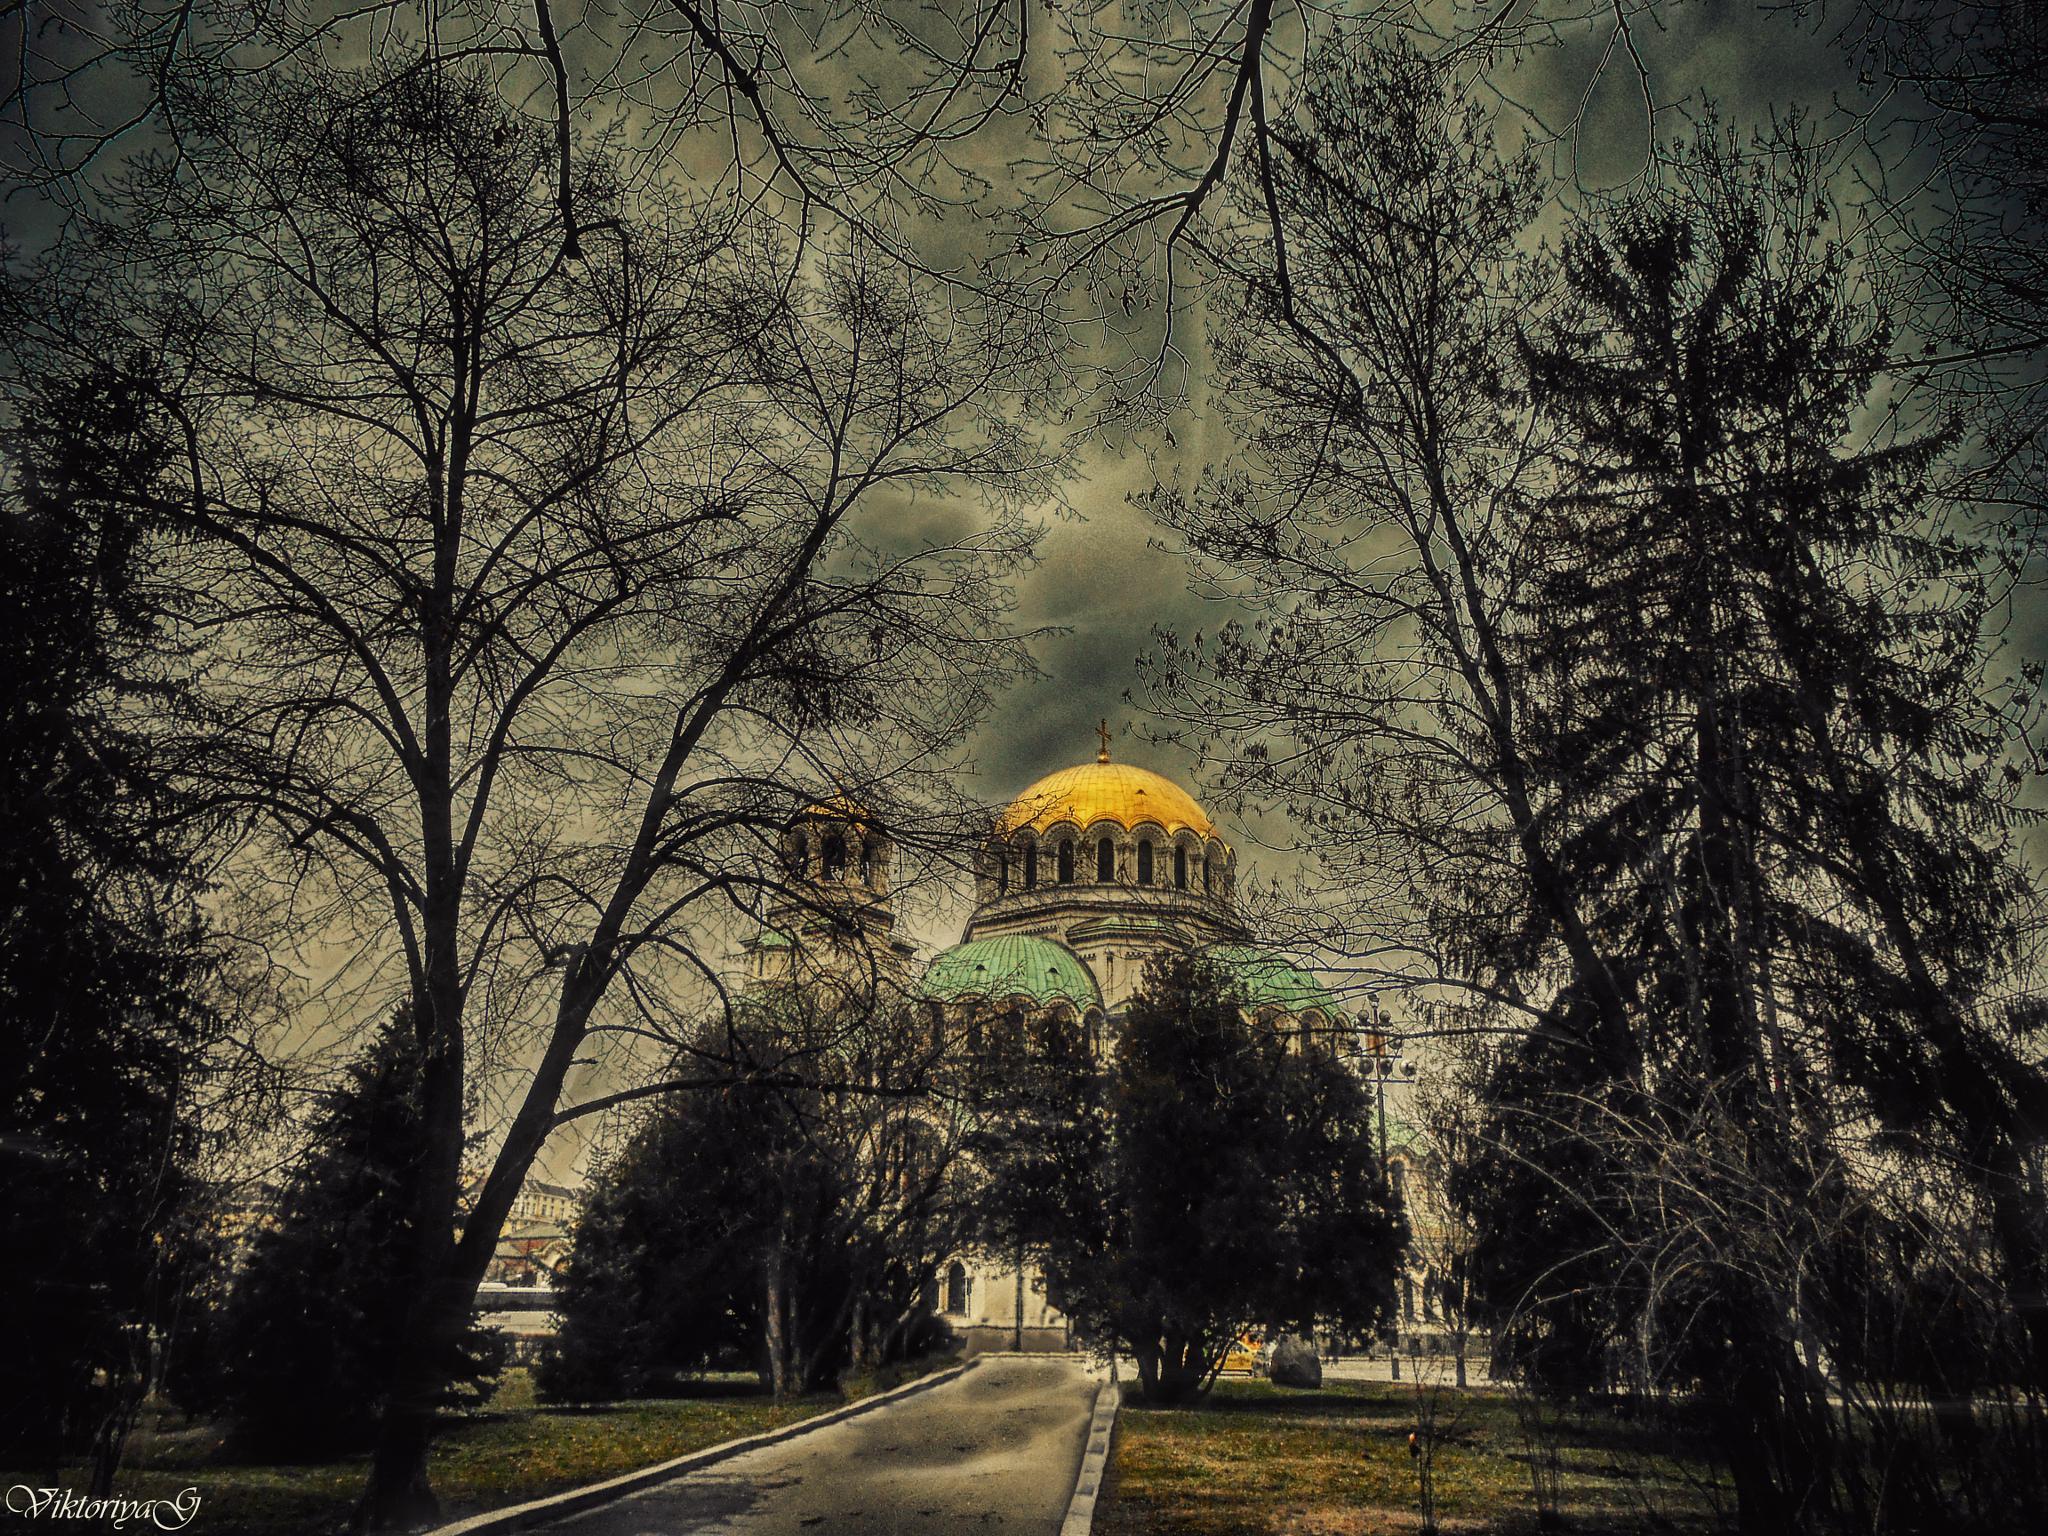 In the arms of trees by Viktoriya Georgieva